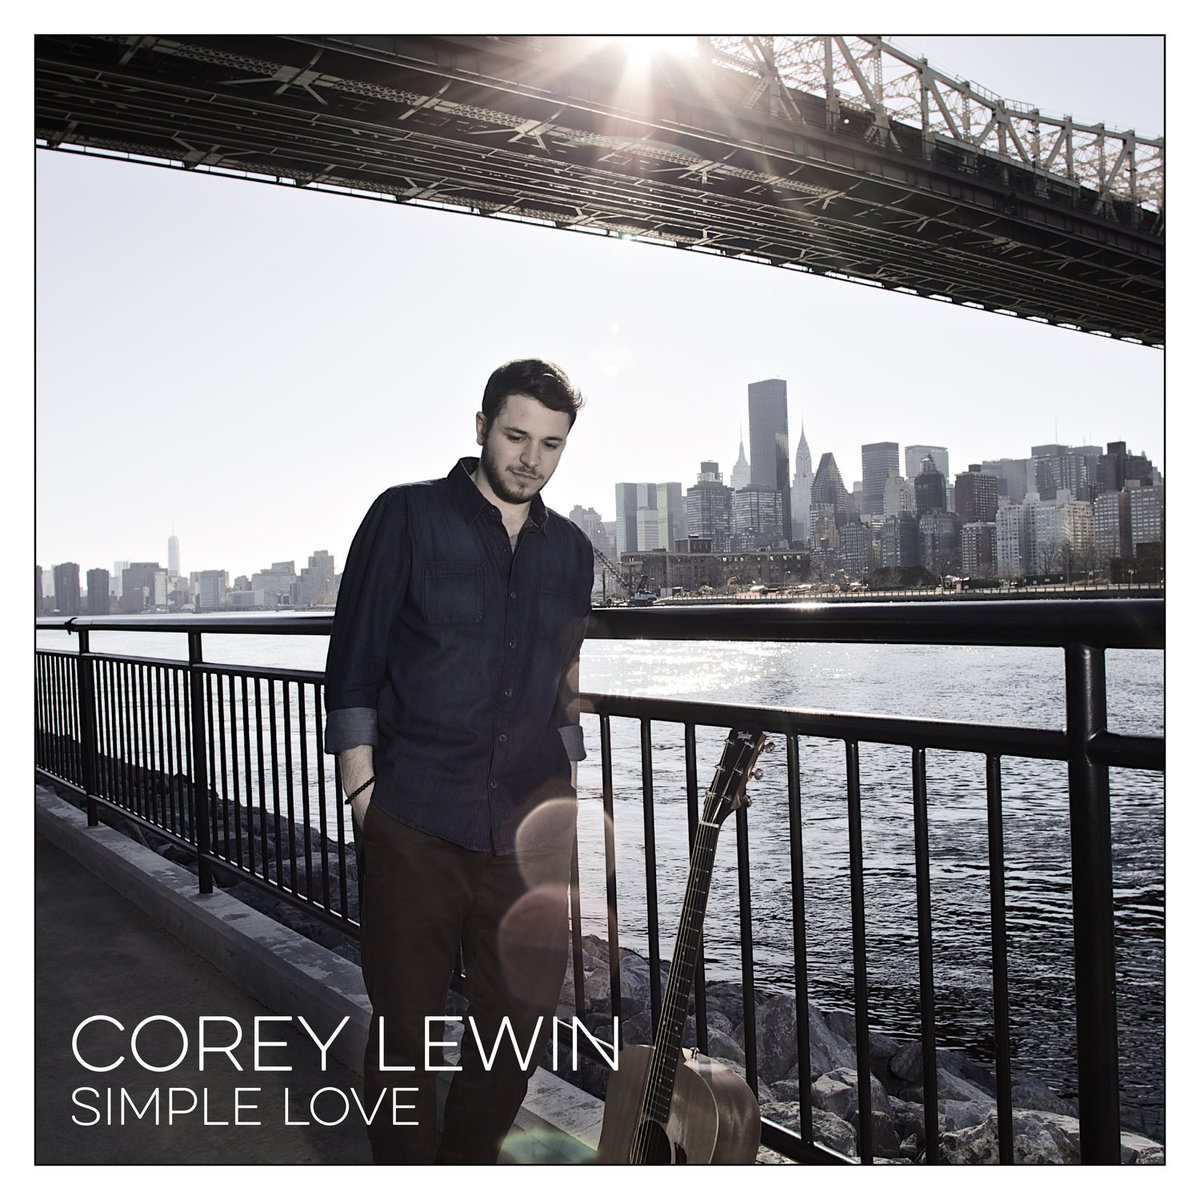 Corey Lewin Simple Love LRG